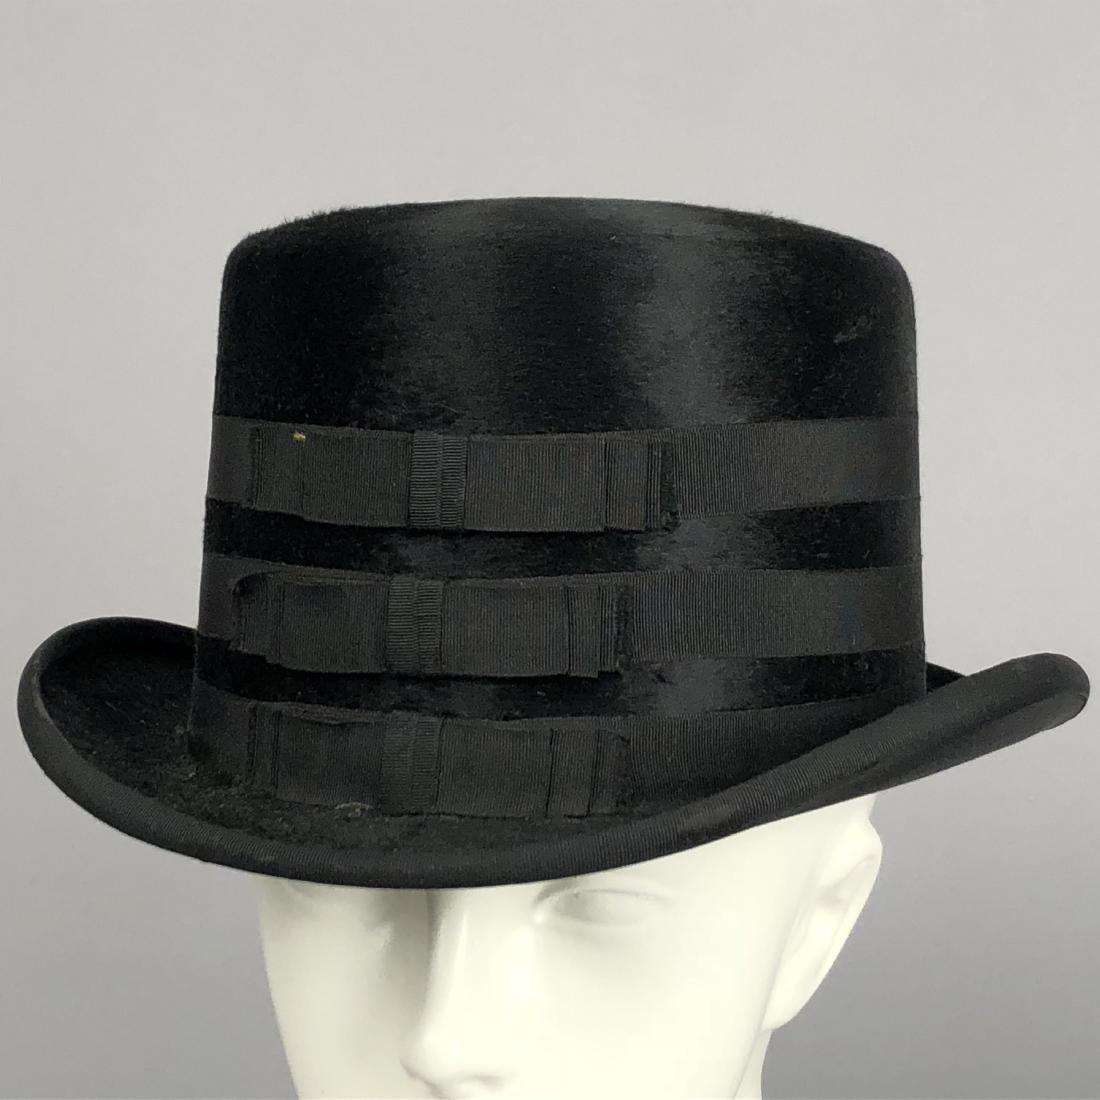 TWO BLACK VELVET WIDE-BRIM HATS, c. 1918 - 3